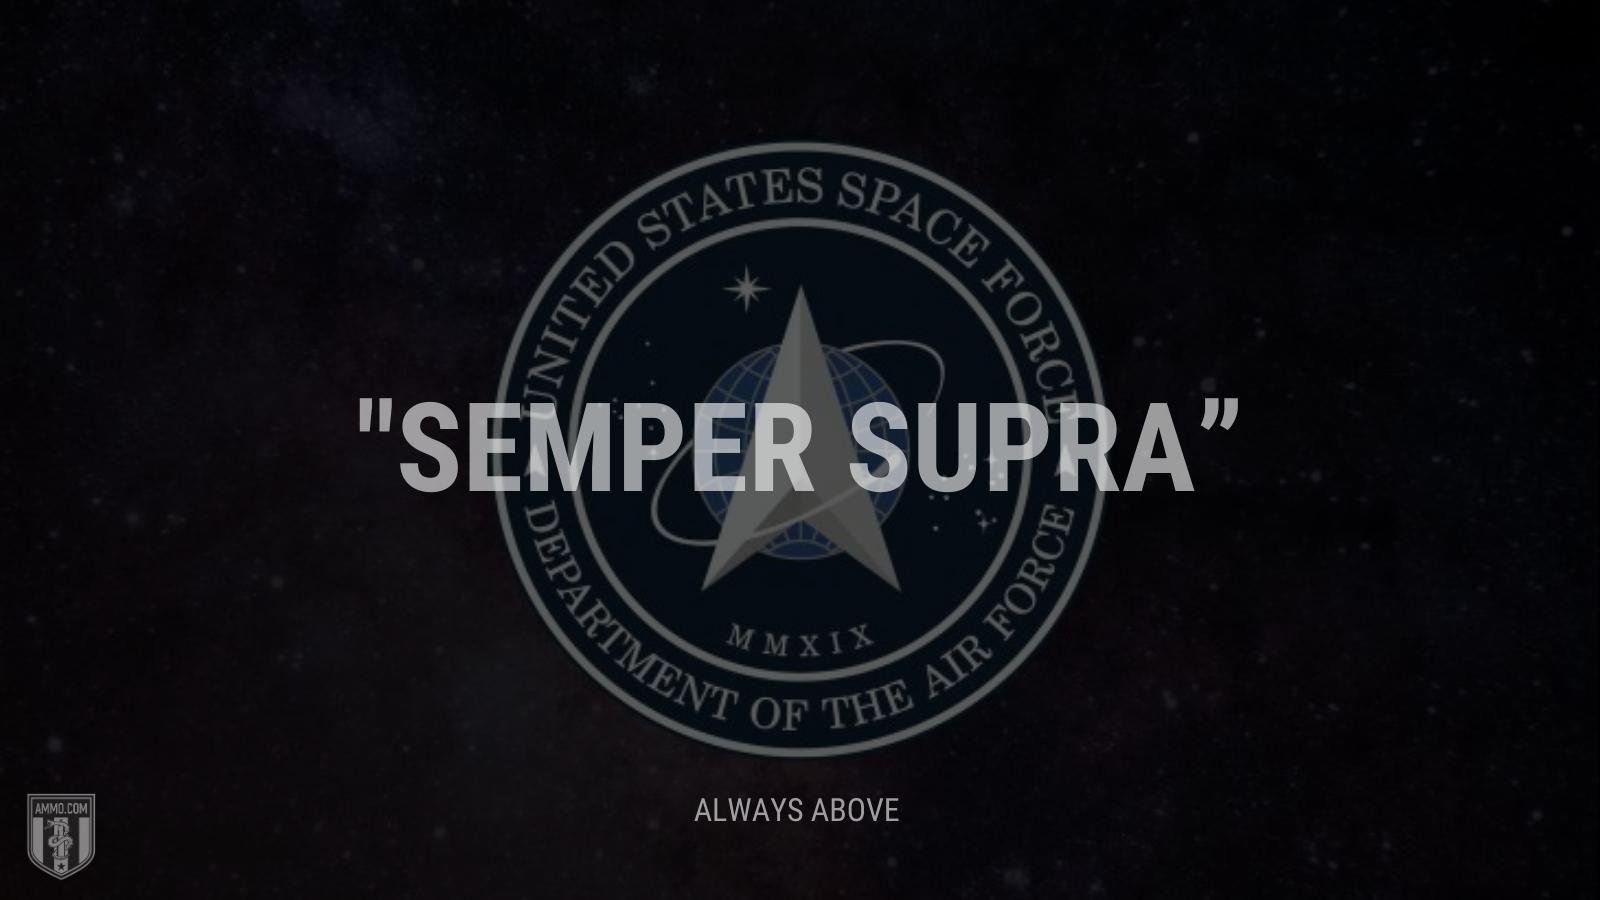 """Semper supra"" - Always above"